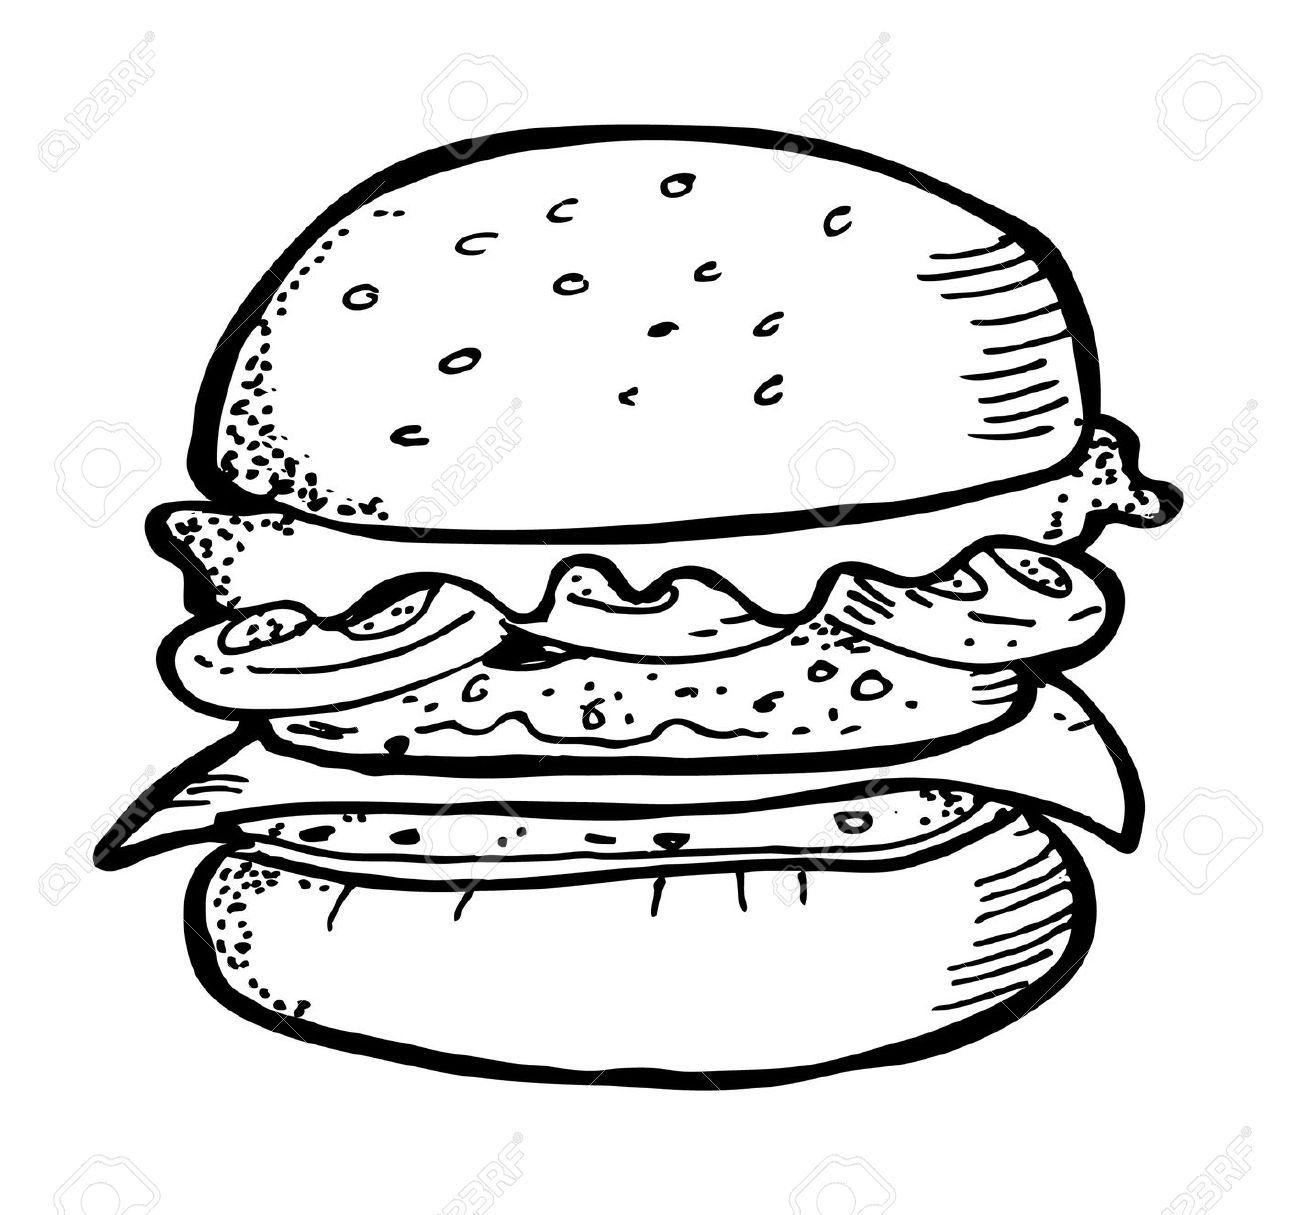 Cheeseburger clipart black and white. Line art graphics google